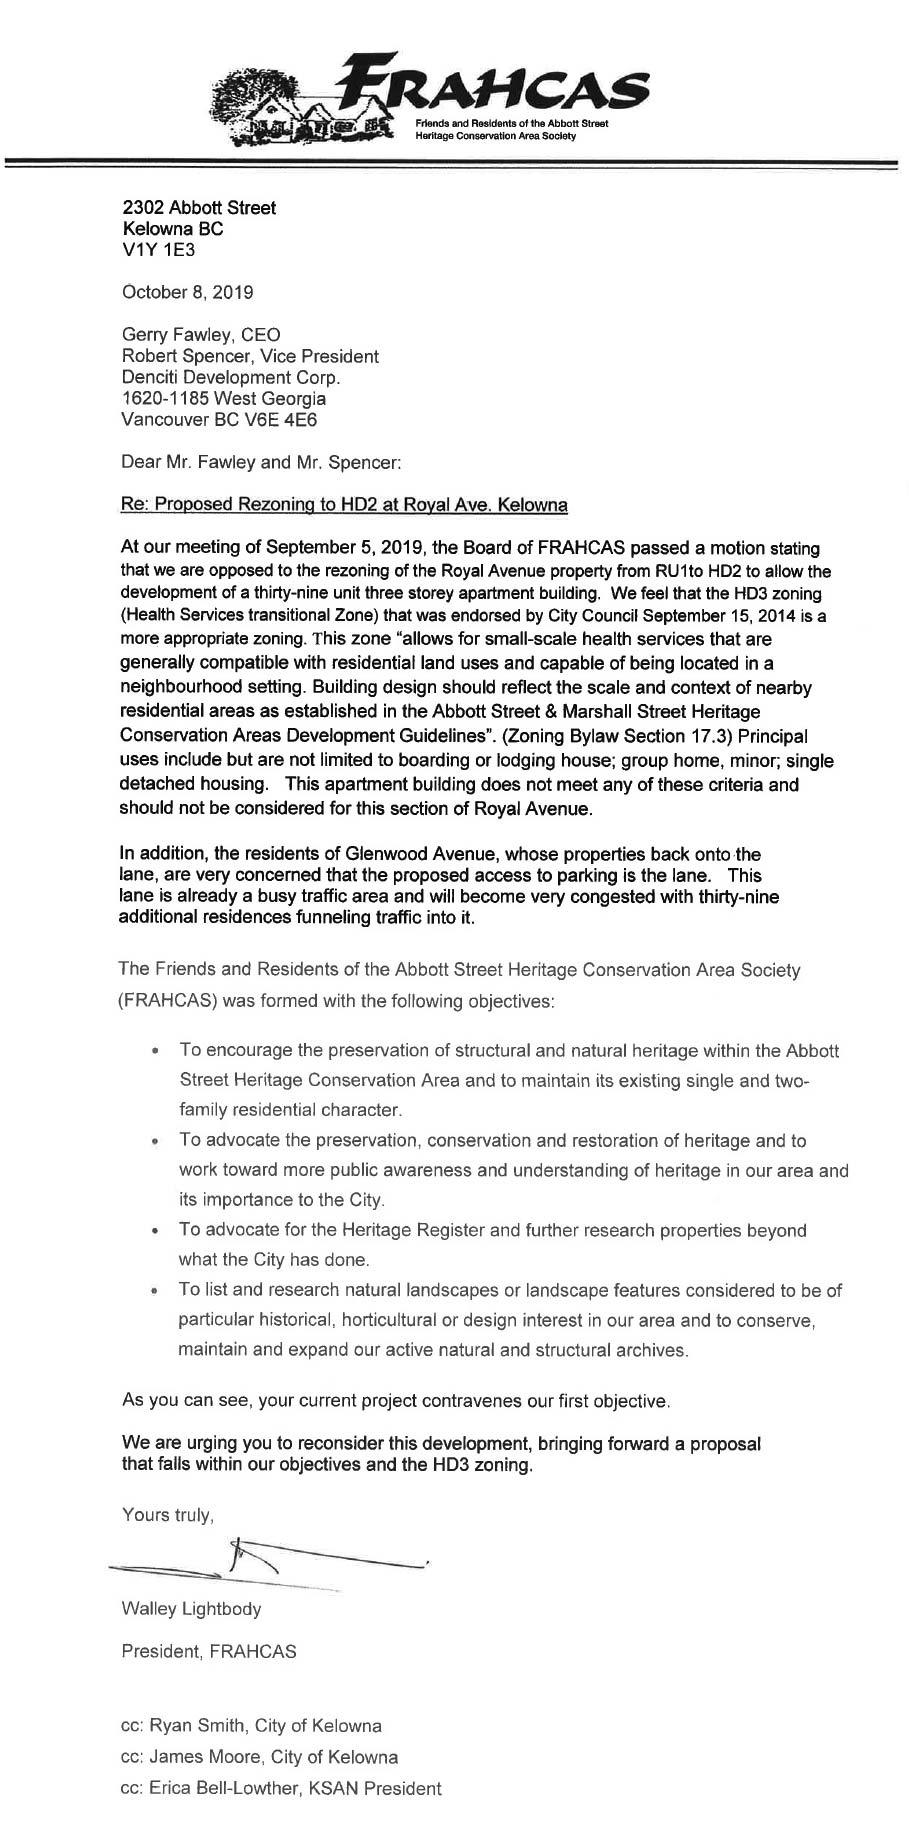 FRAHCAS letter to Royal Avenue Developer Denciti